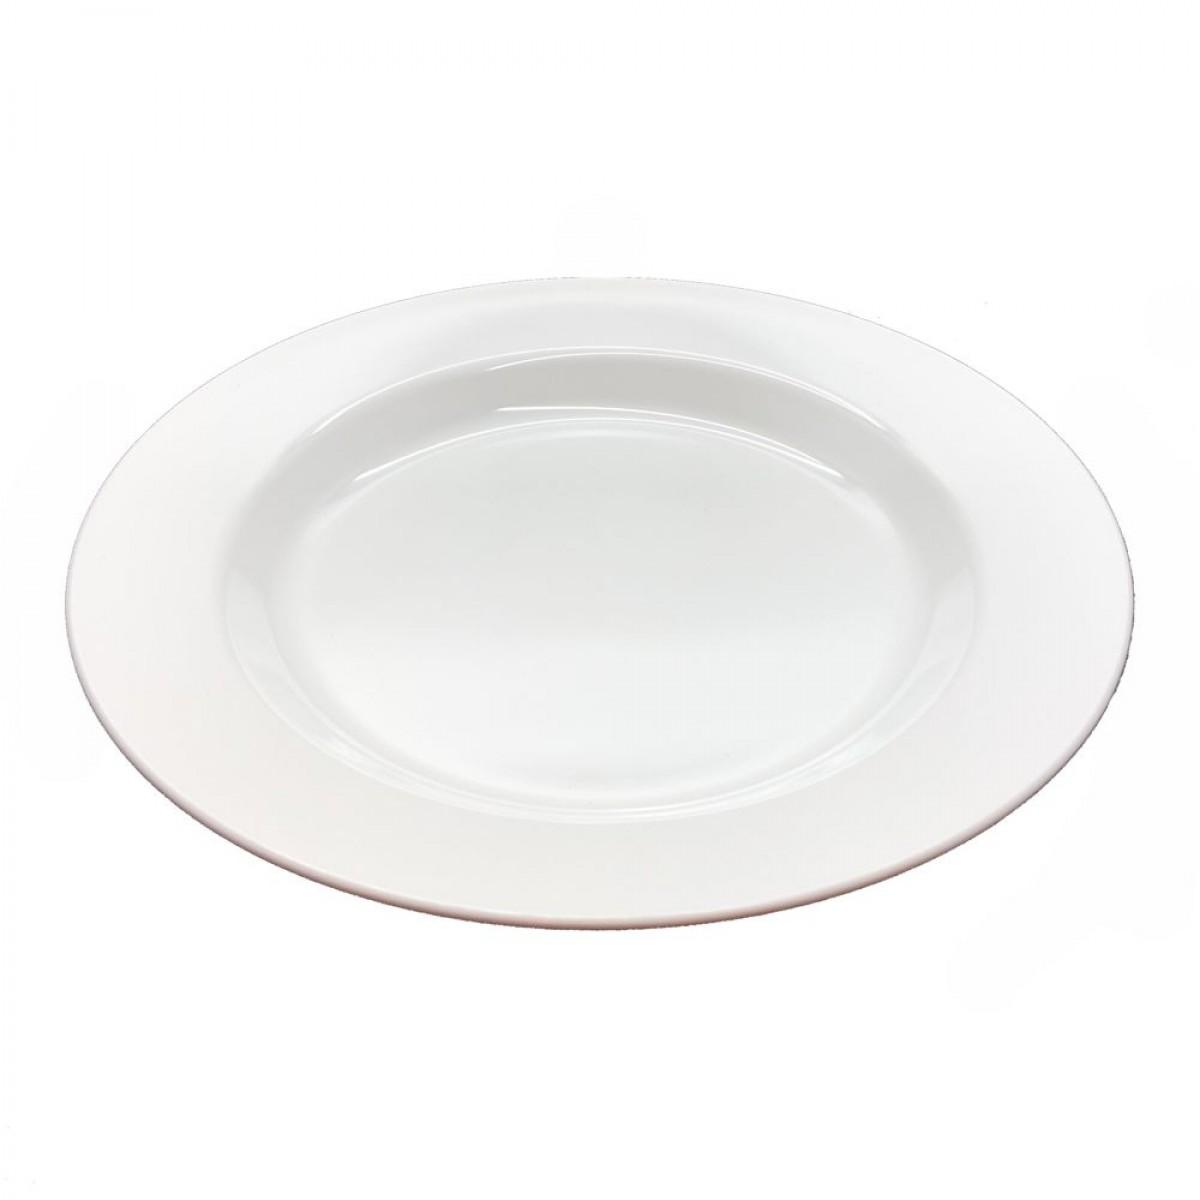 PLAST1 Melamin dyb tallerken 25 cm hvid